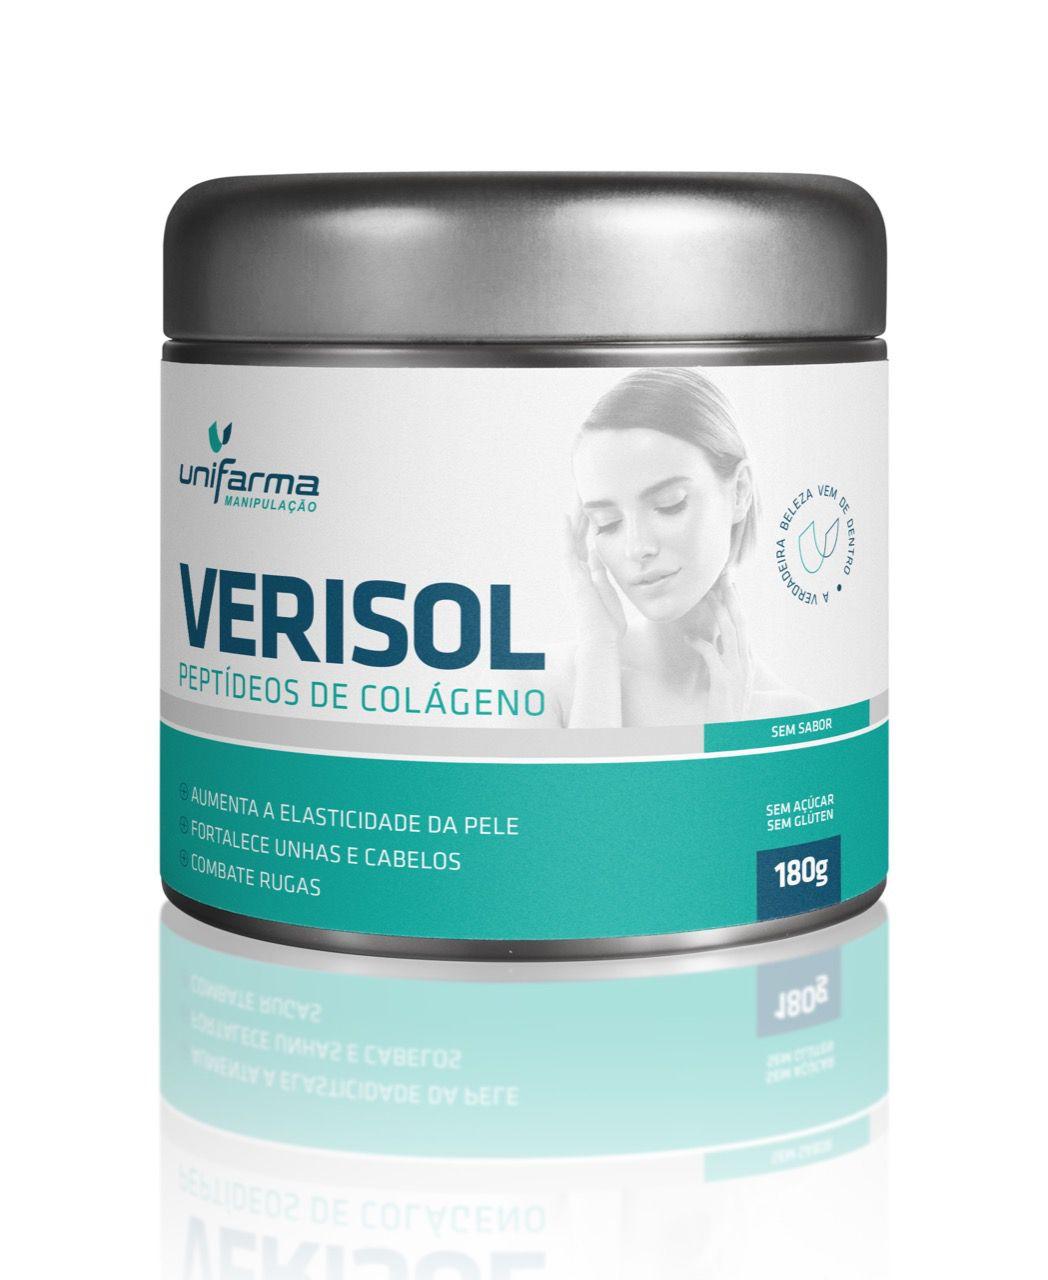 "Verisol 2,5 gramas - 150 gr  "" Tratamento para 2 meses"""